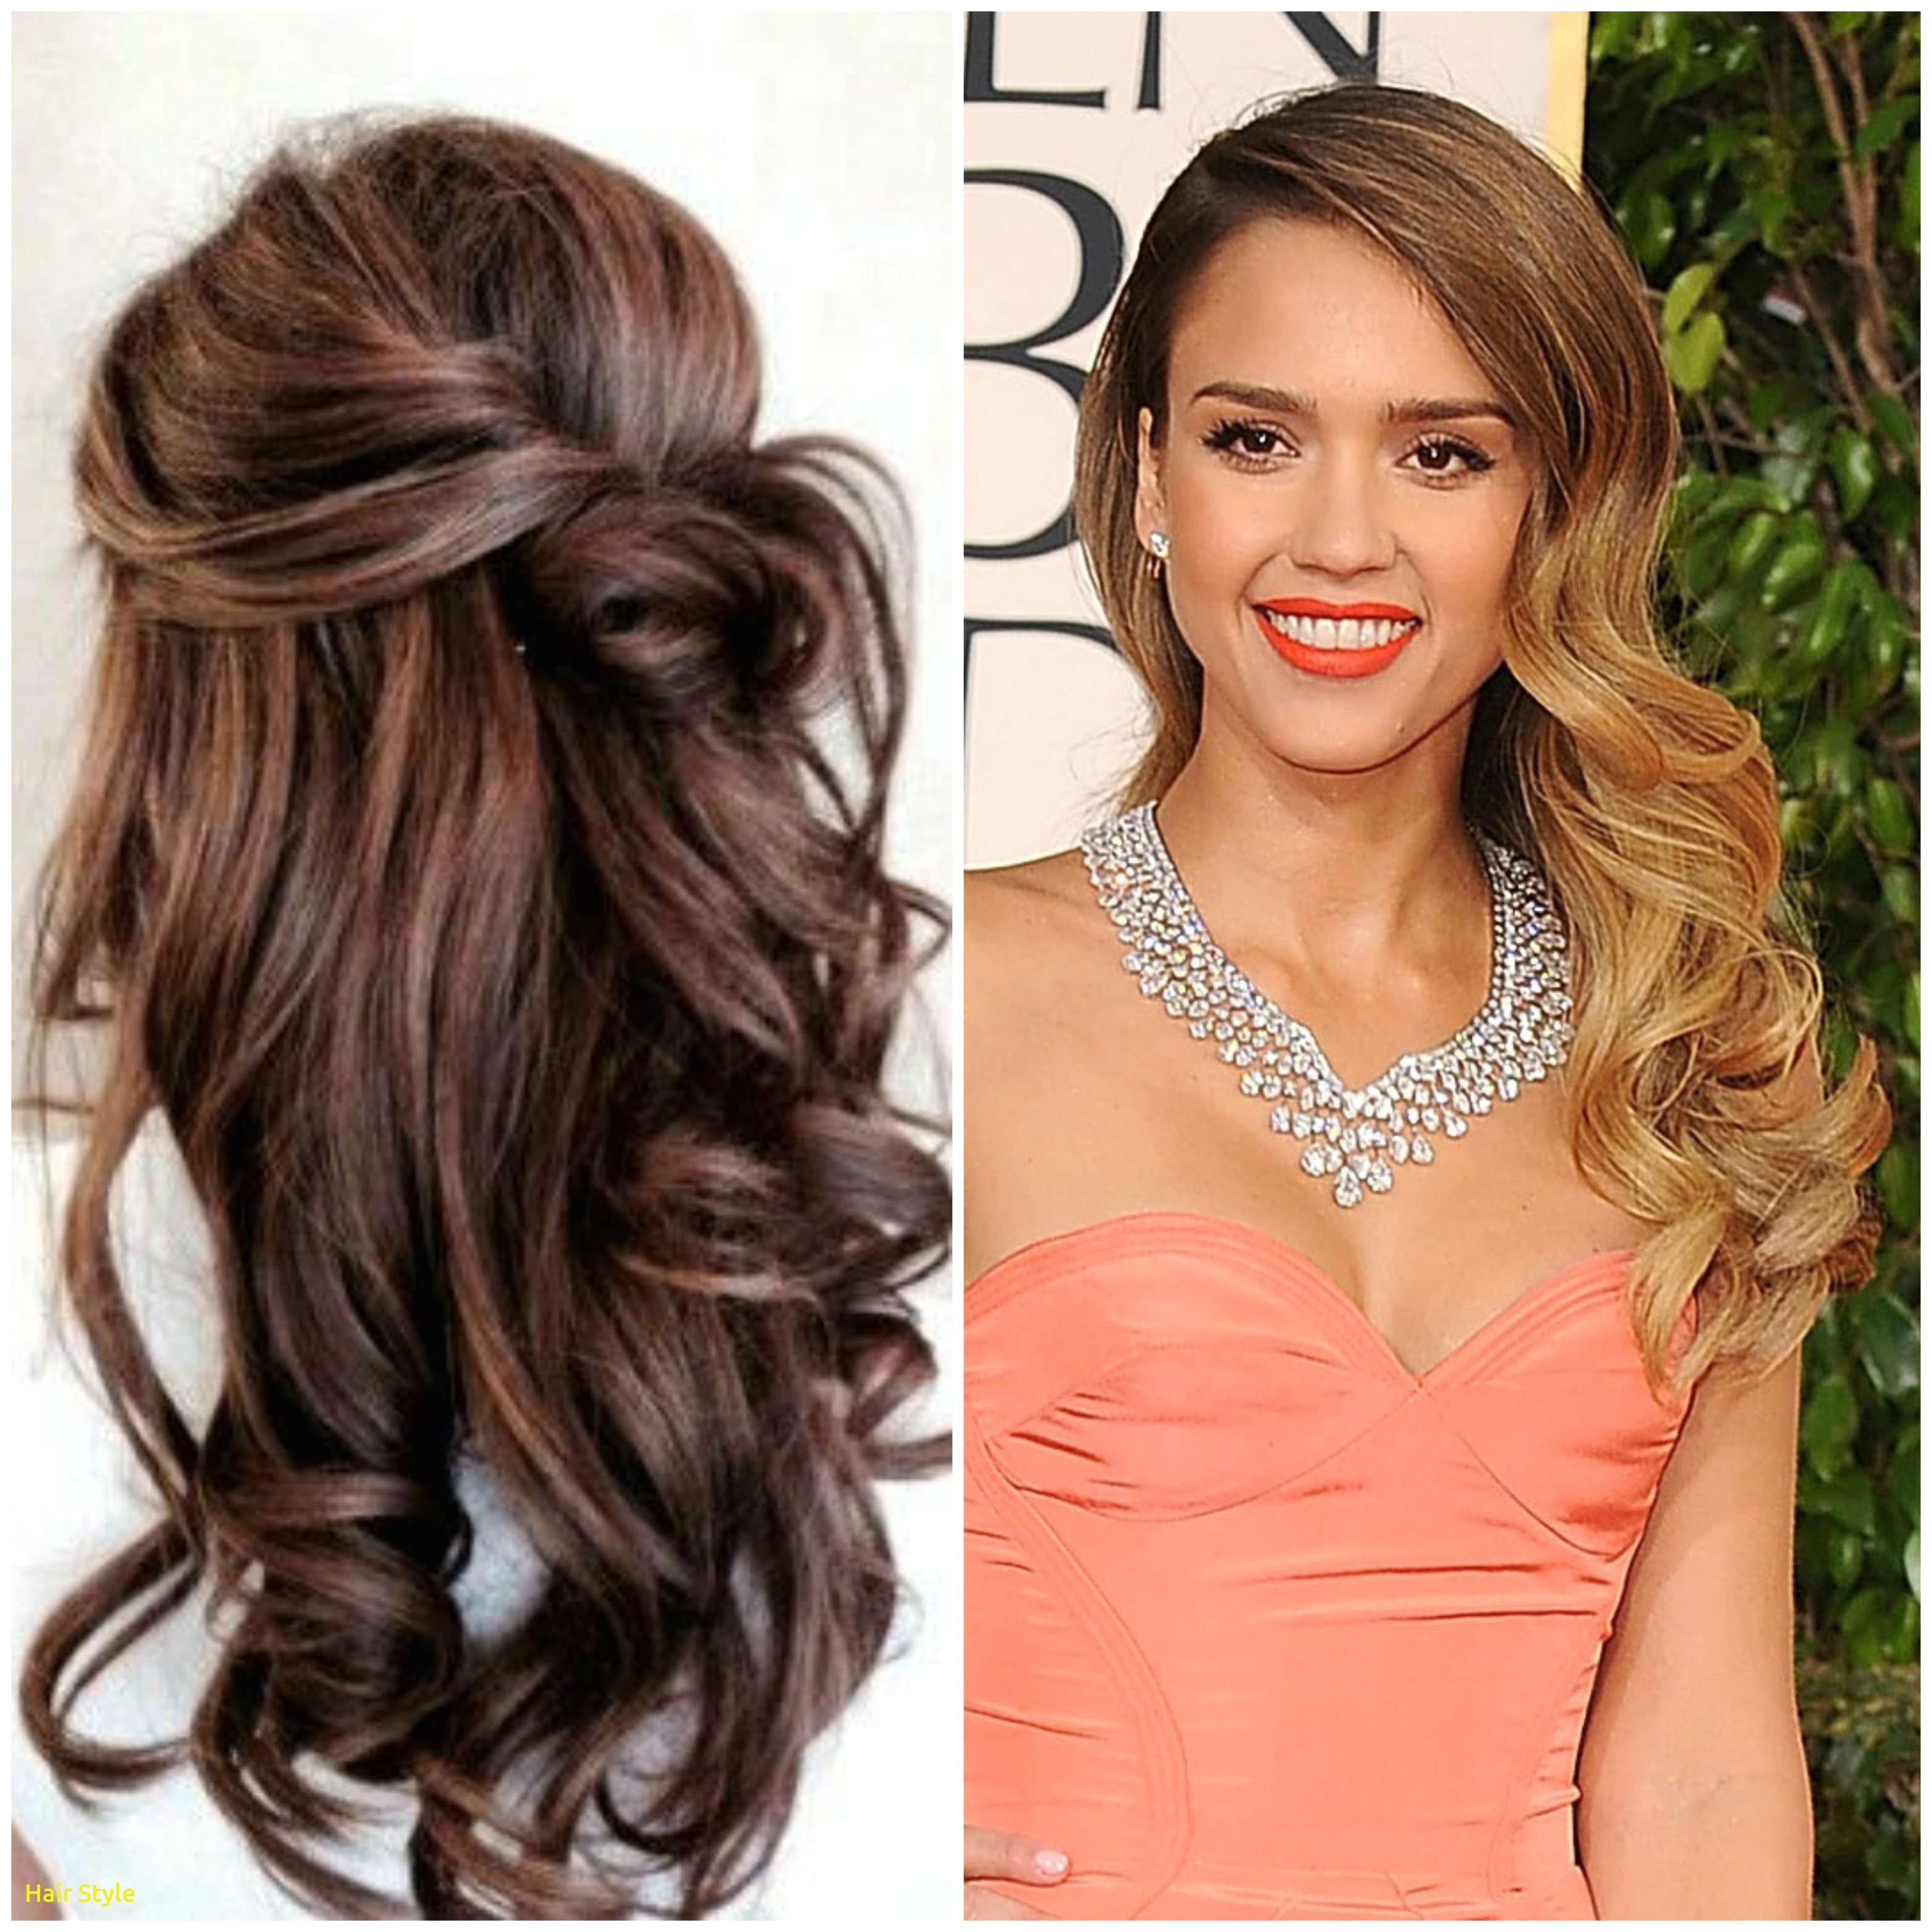 haircut ideas long straight hair luxury inspirational hairstyles for long hair 2015 luxury i pinimg 1200x